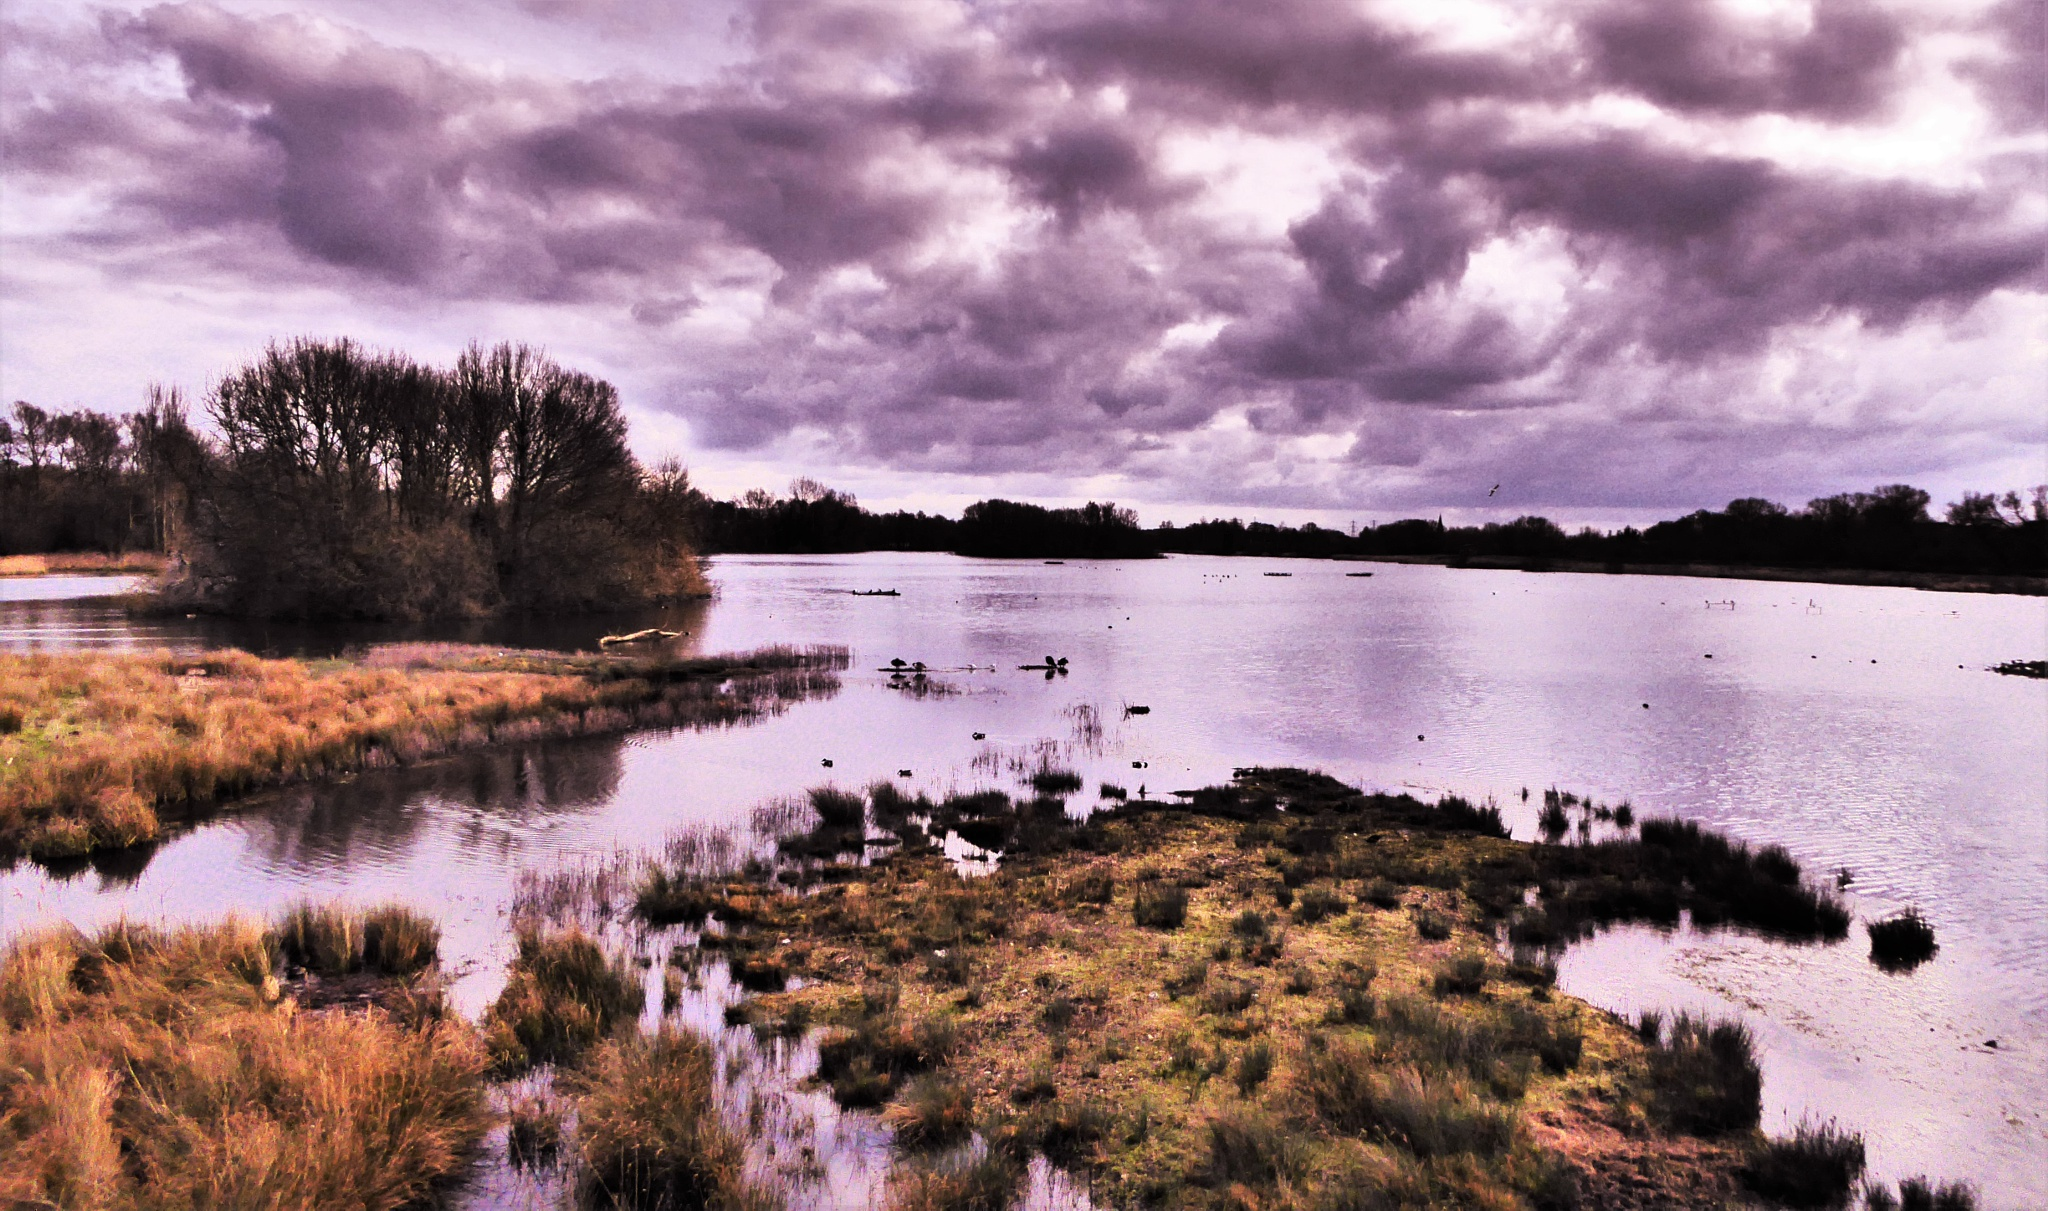 Amwell Nature Reserve 2 by Rom Pasika